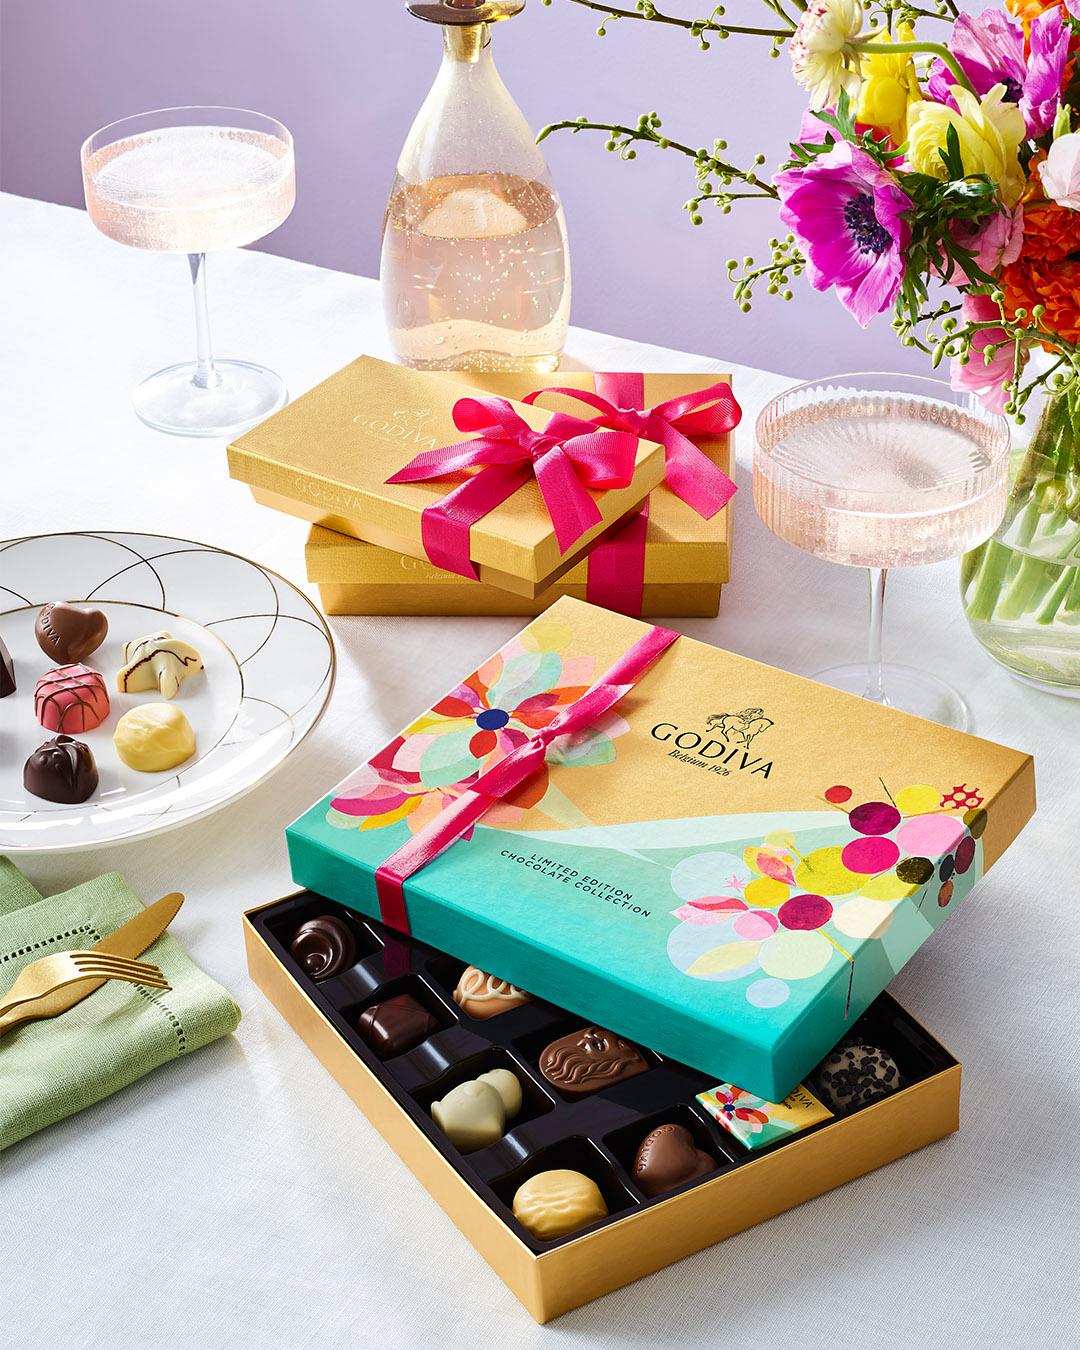 Springtime at GODIVA! from Godiva Chocolatier